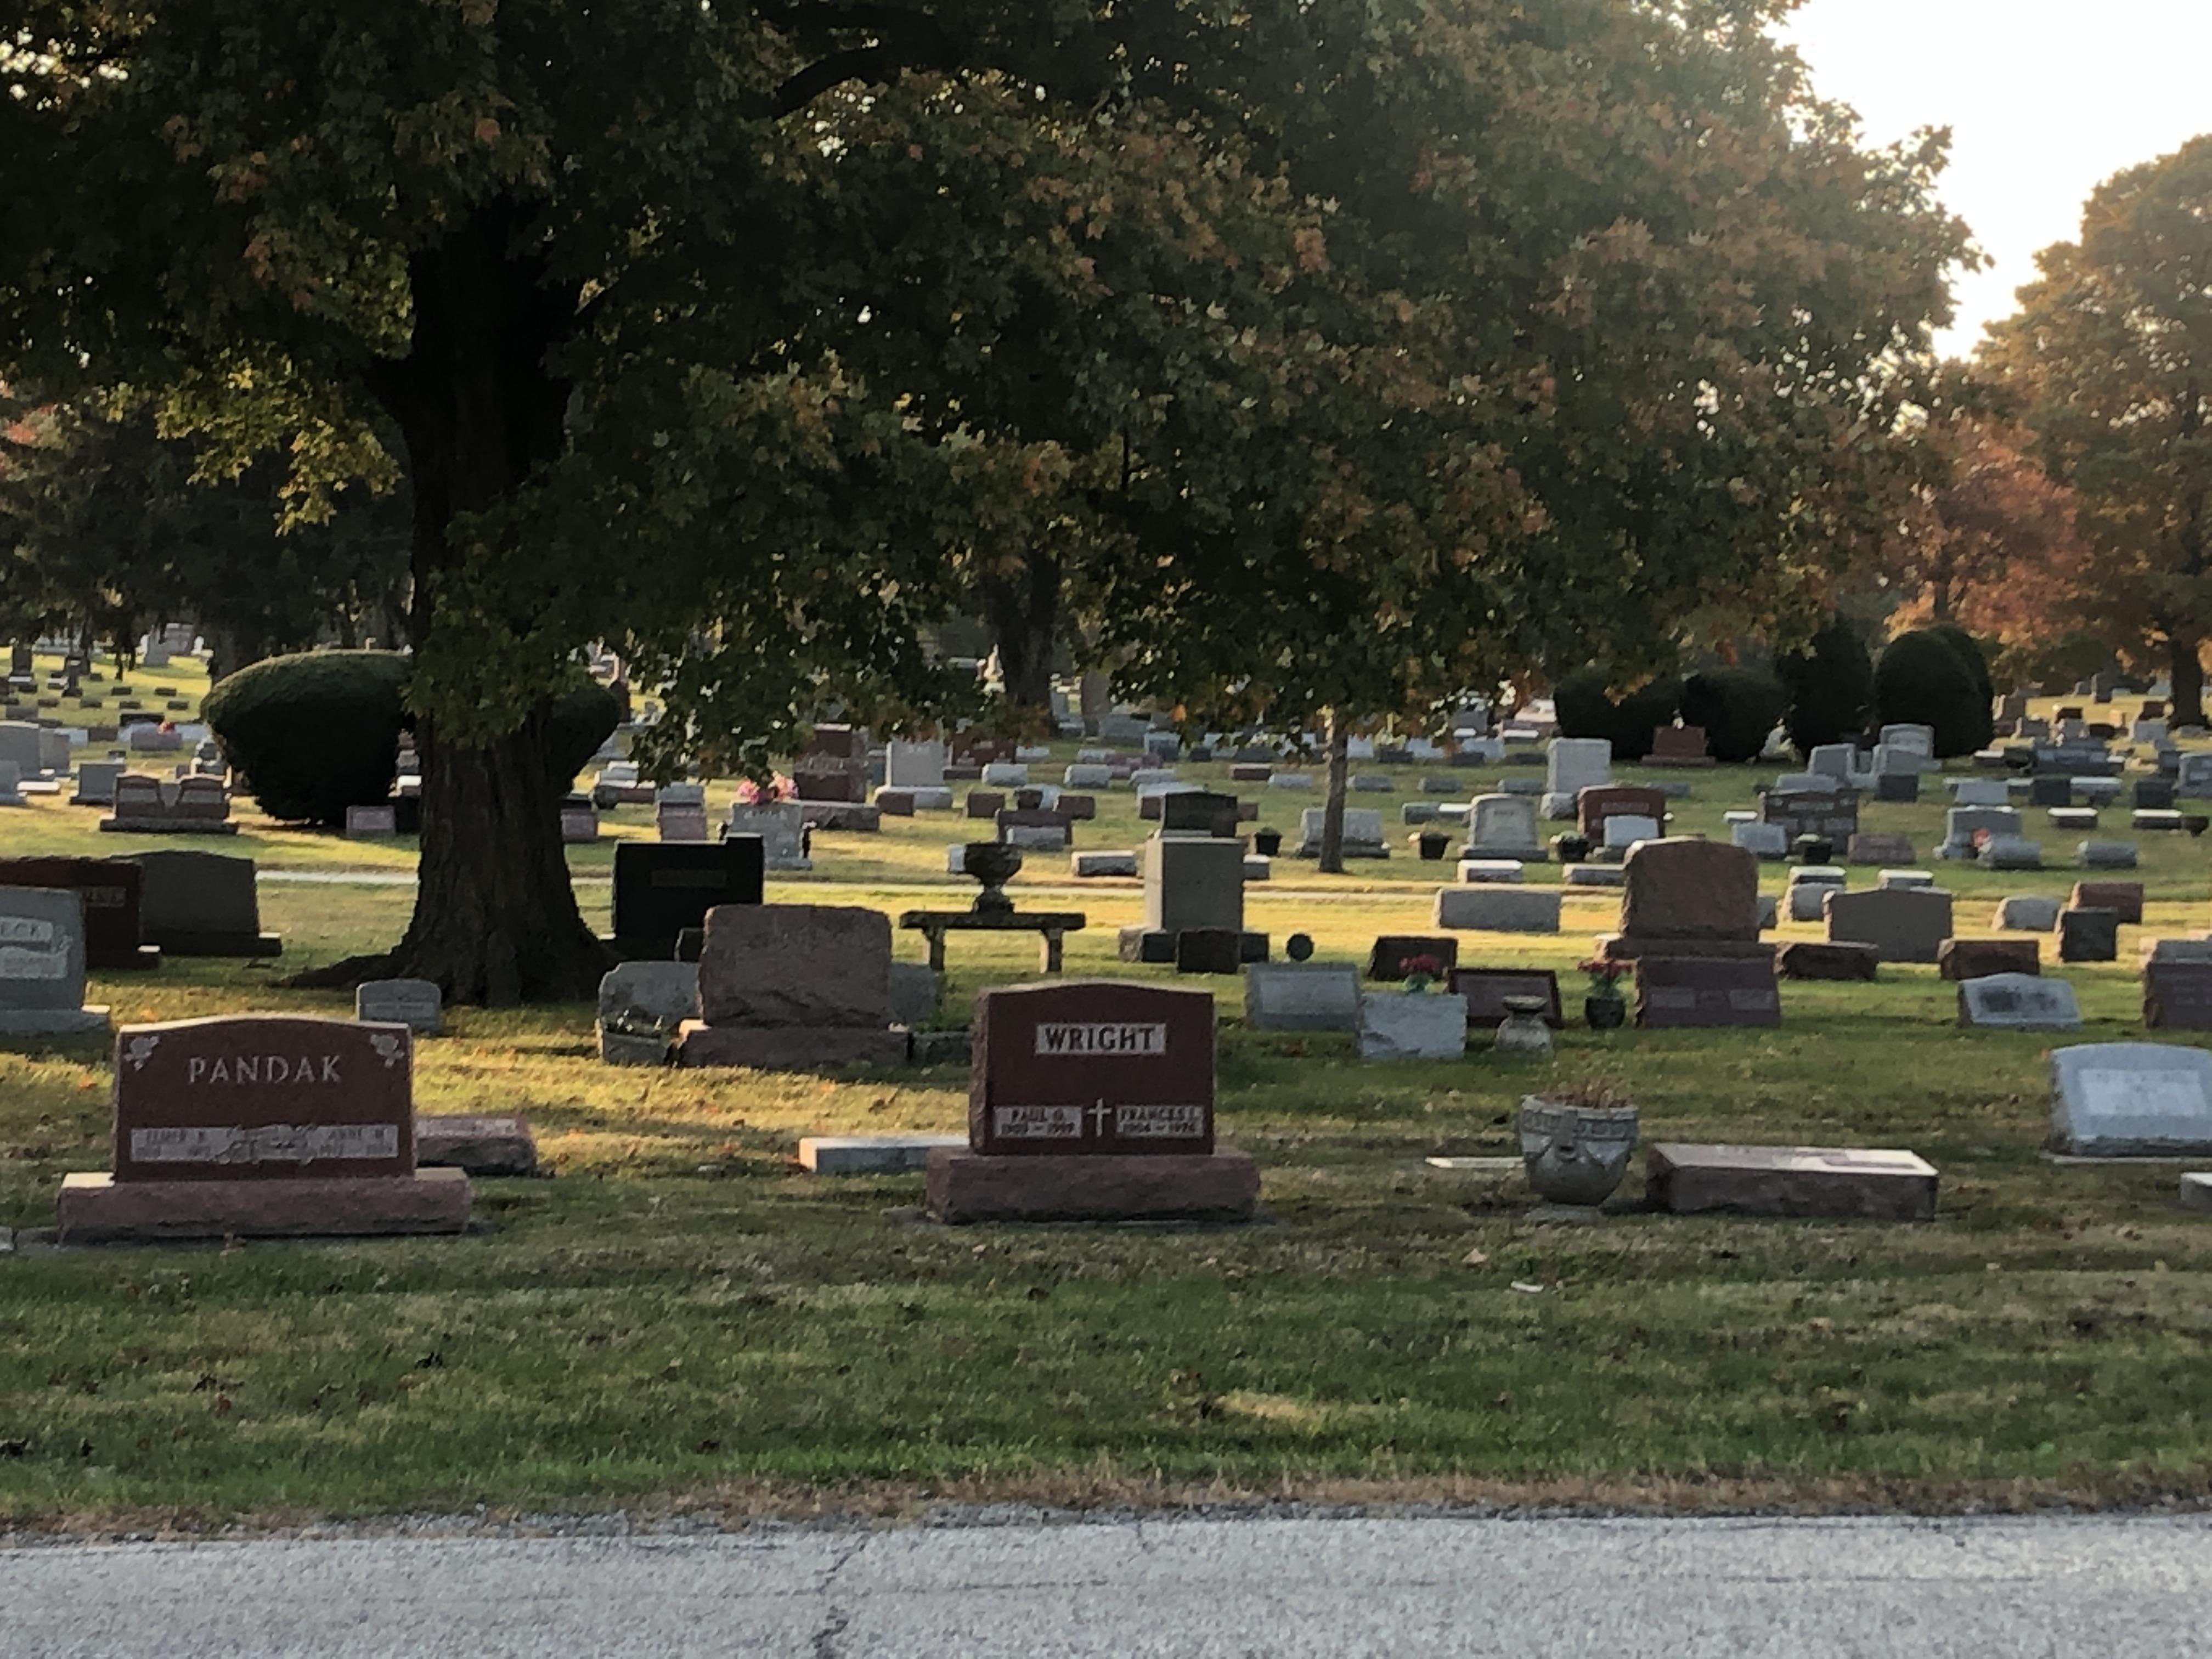 a graveside burial cemetery